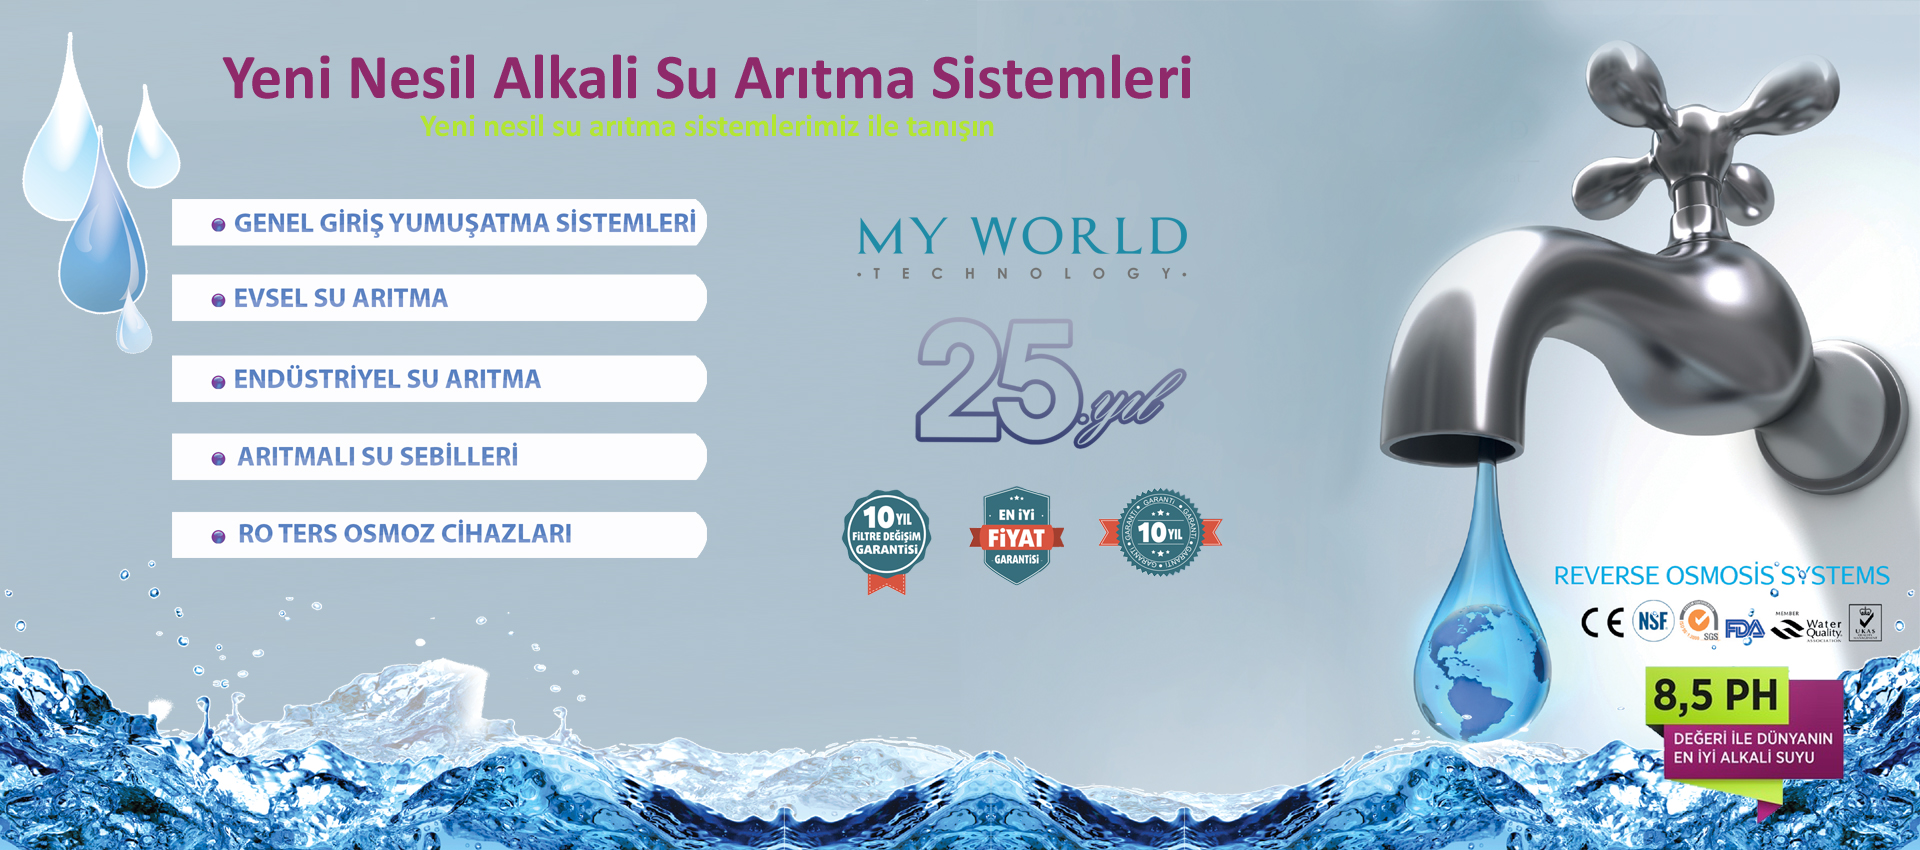 my_world_teknoloji_su_arıtma_sistemleri